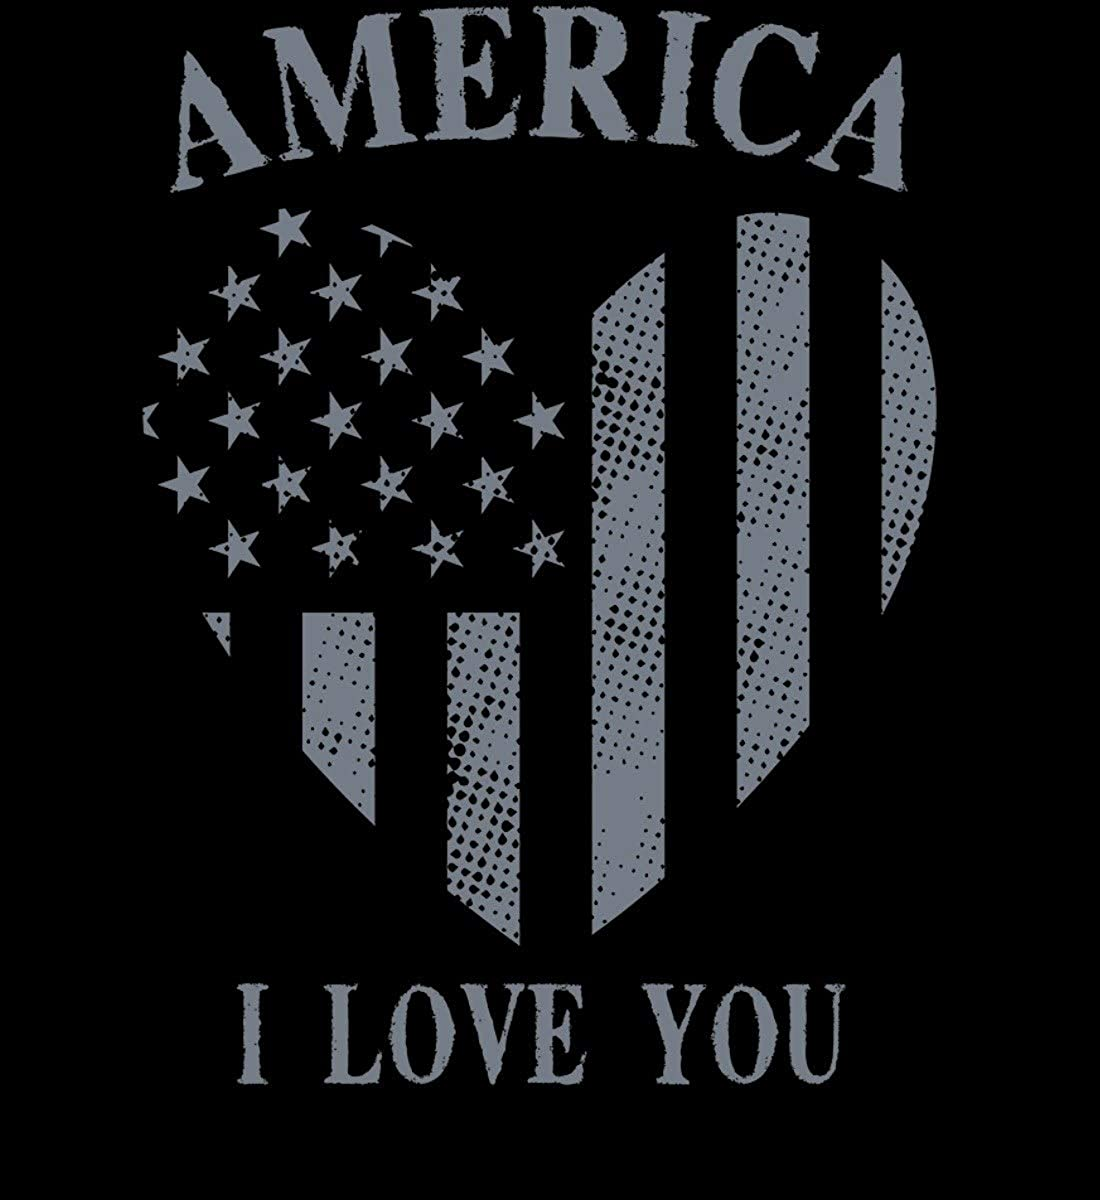 Sons Of Liberty Hoodie America I Love You Sweatshirt